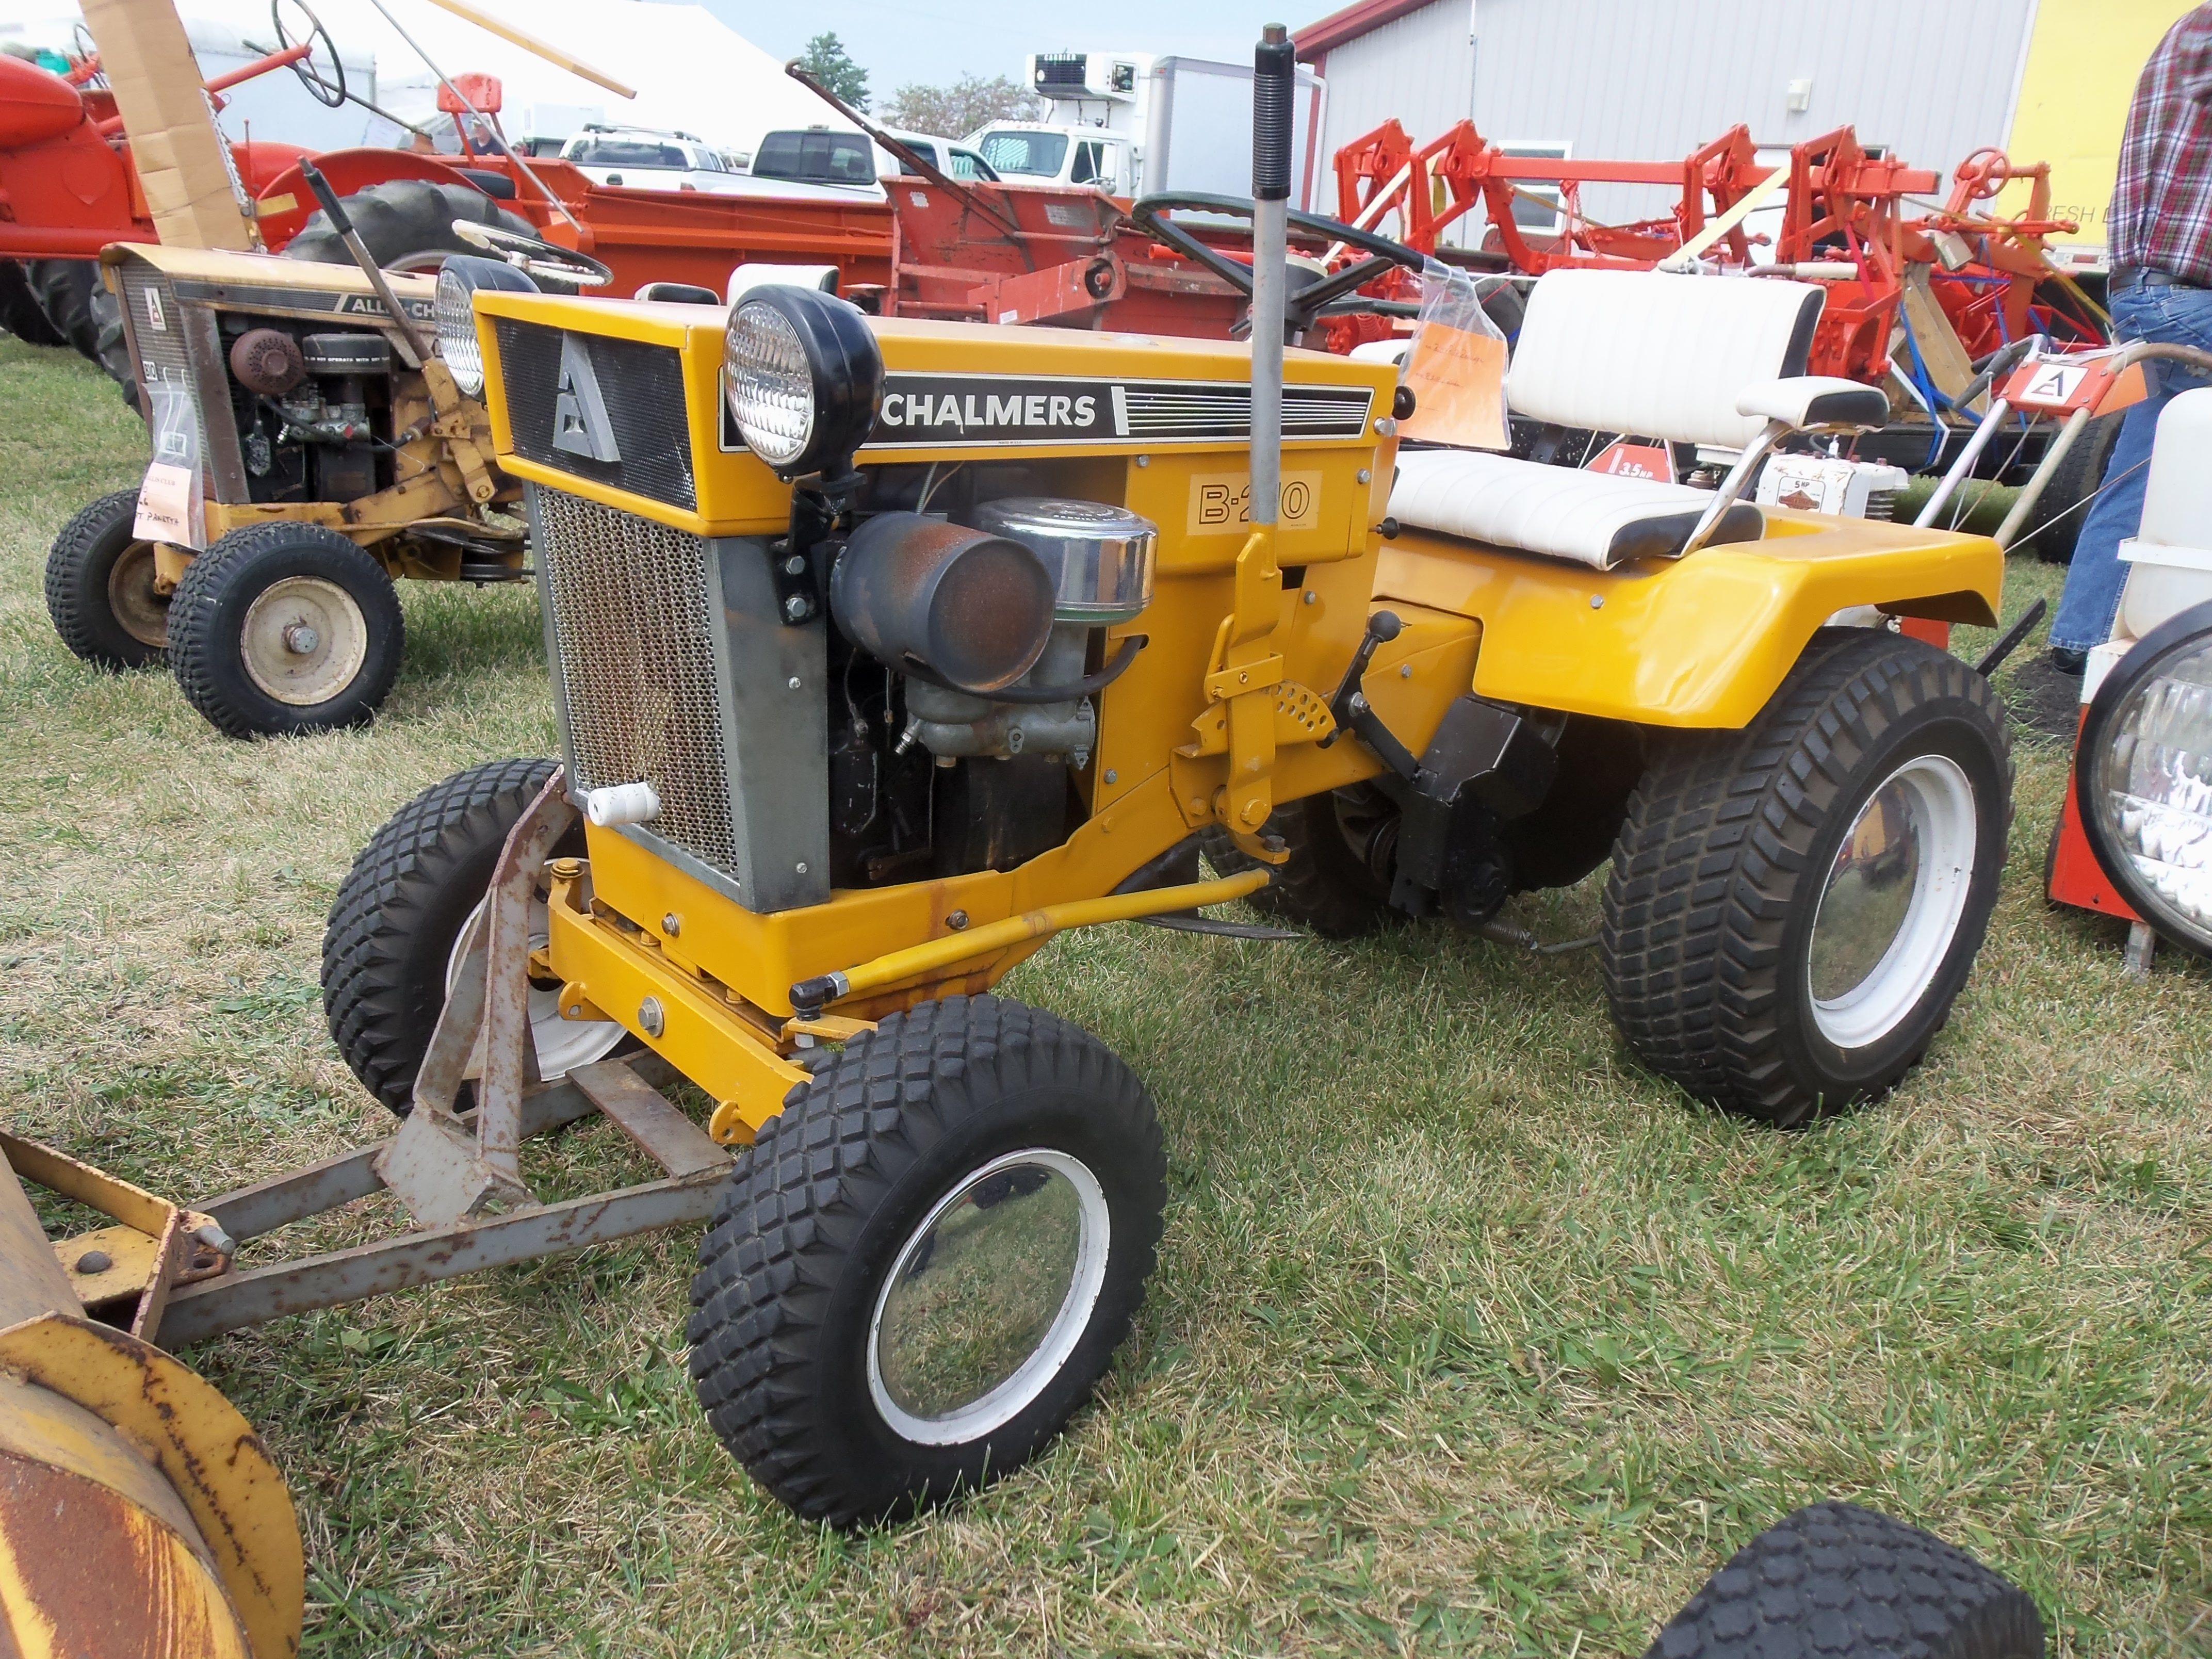 Allis Chalmers B210   Allis-Chalmers   Pinterest   Tractor